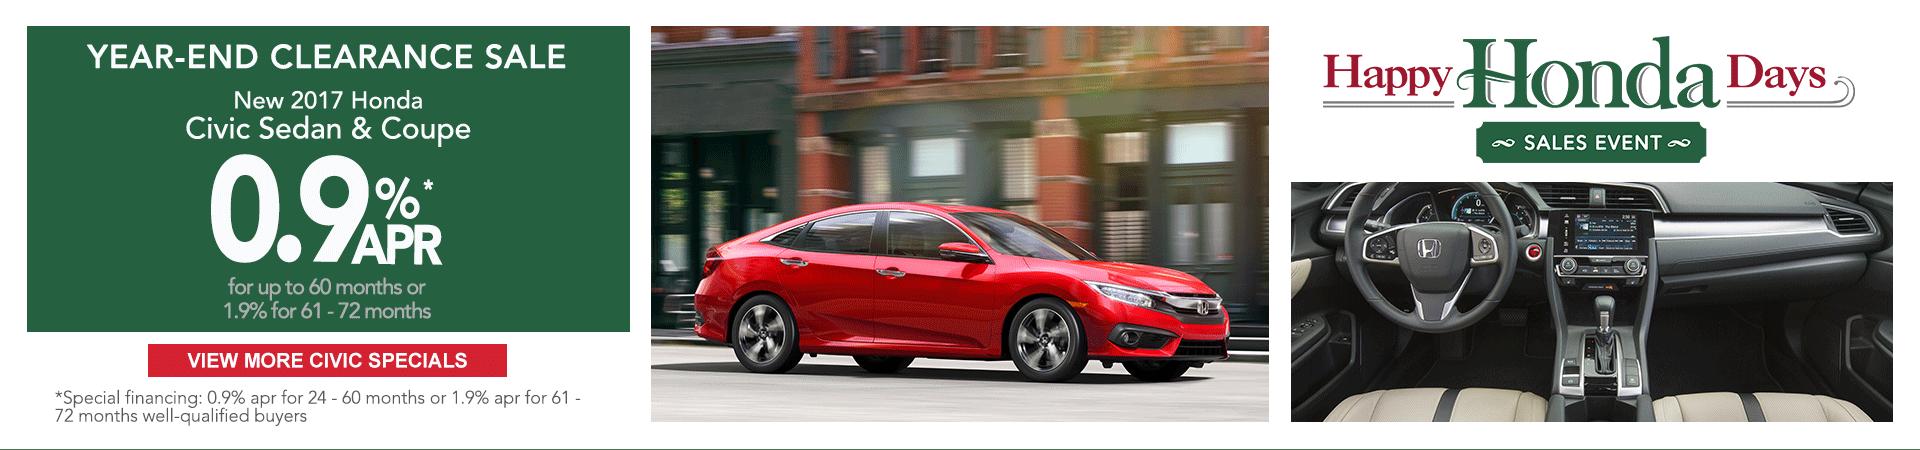 Honda Civic clearance finance specials